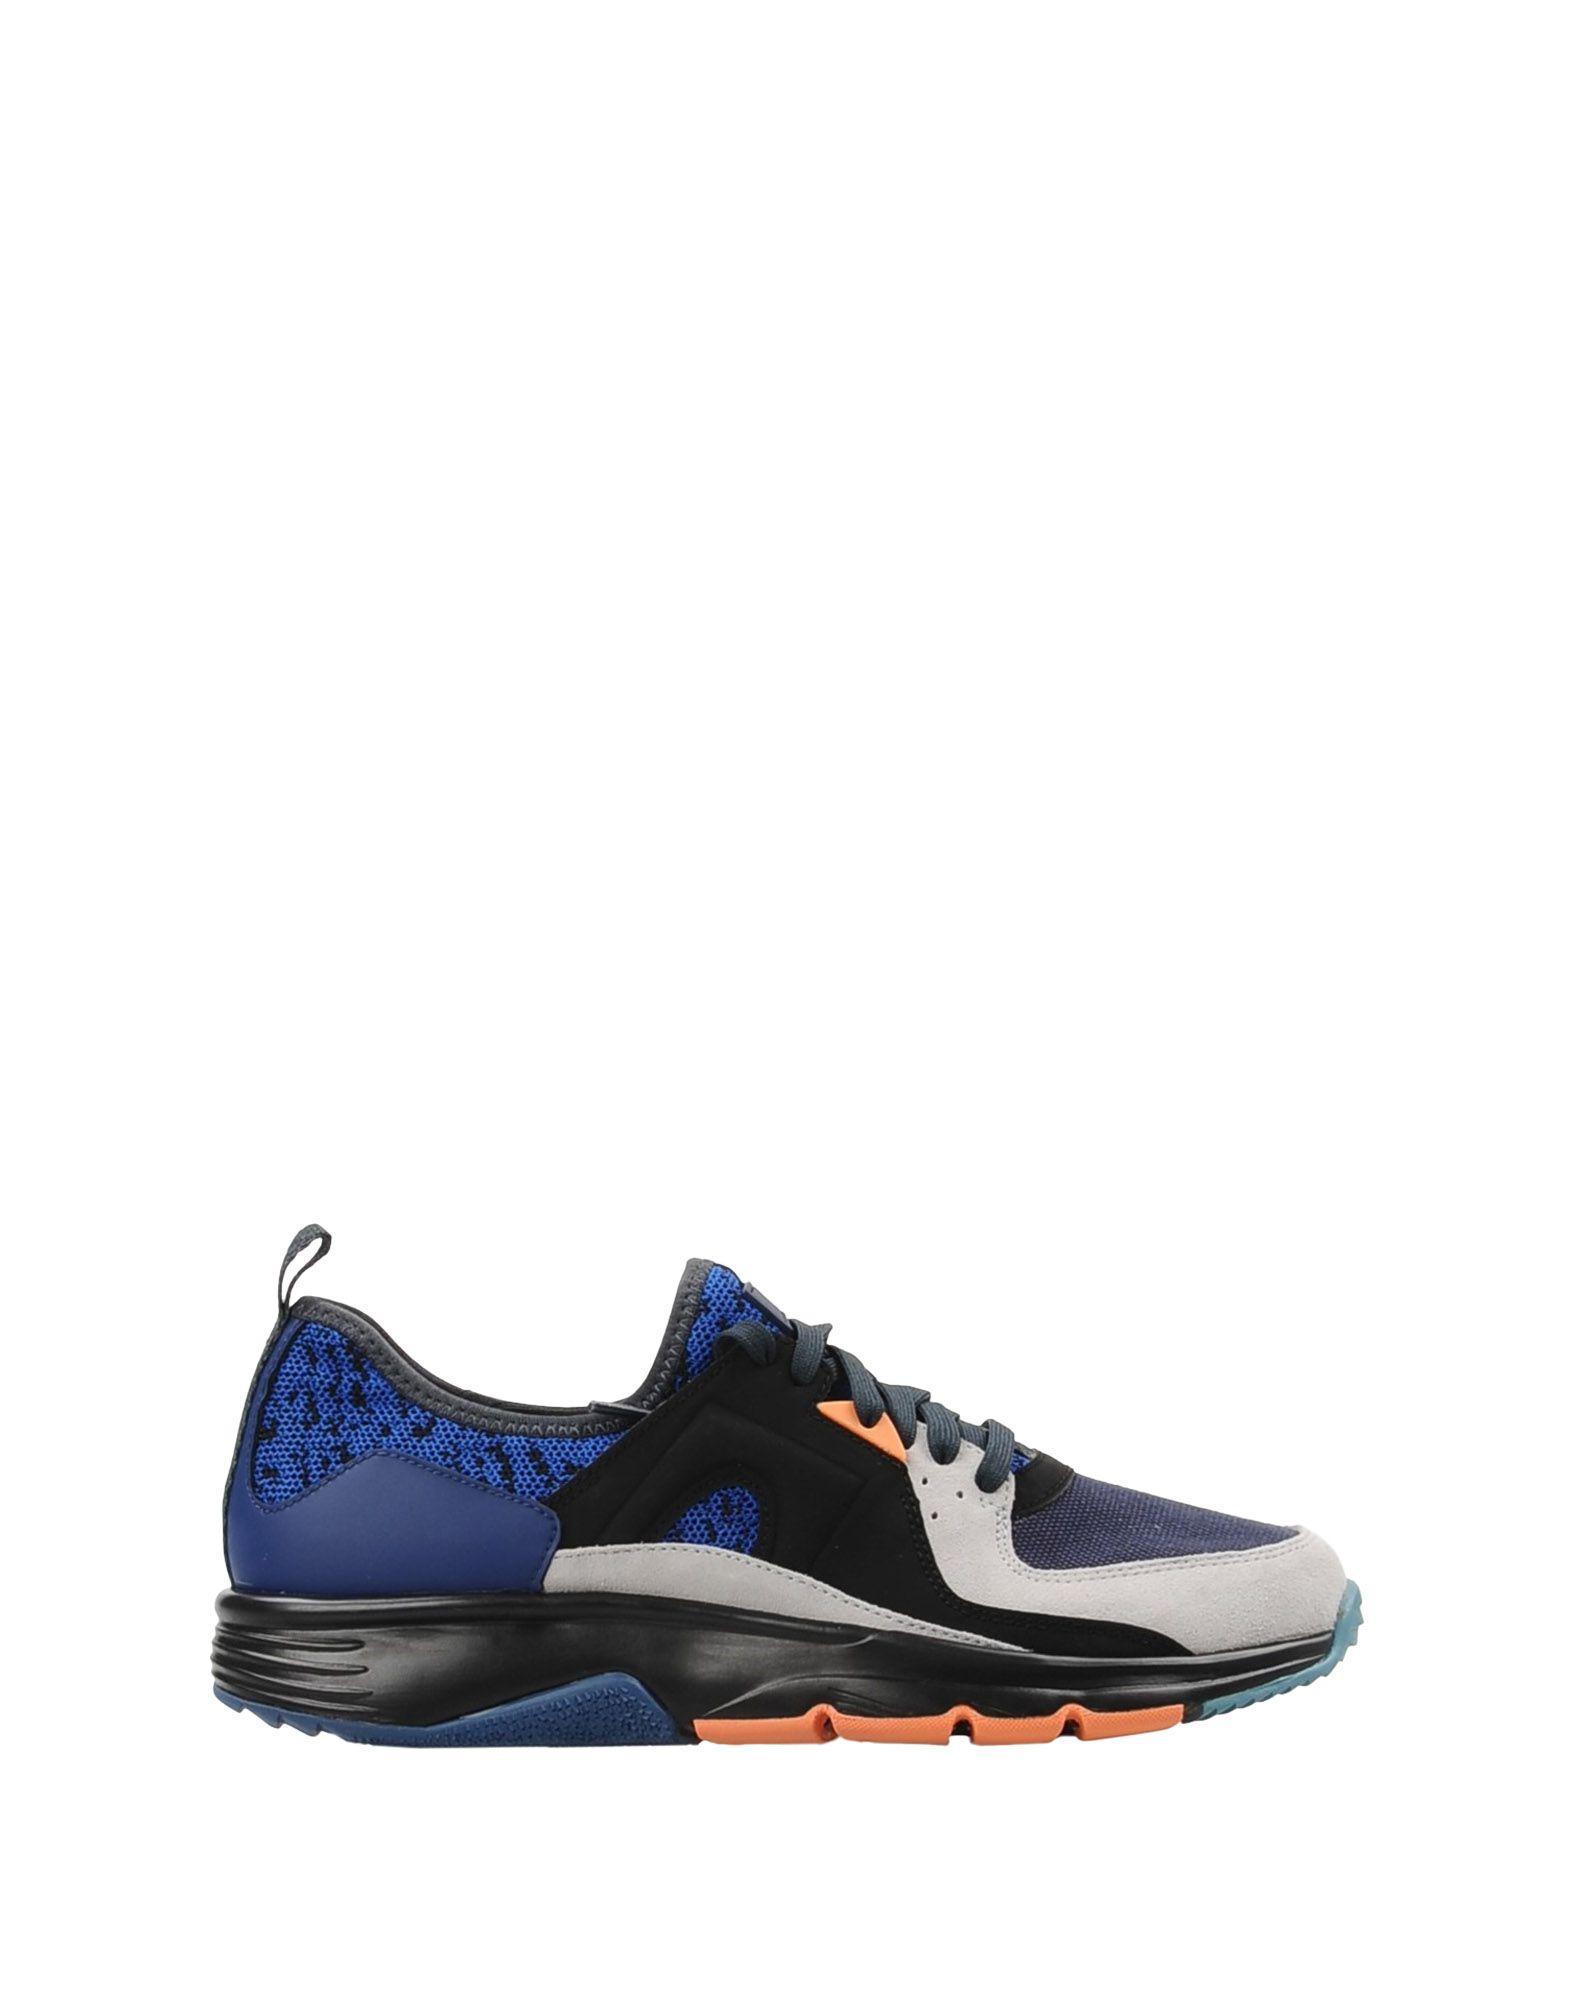 Sneakers Camper Drift - Femme - Sneakers Camper sur